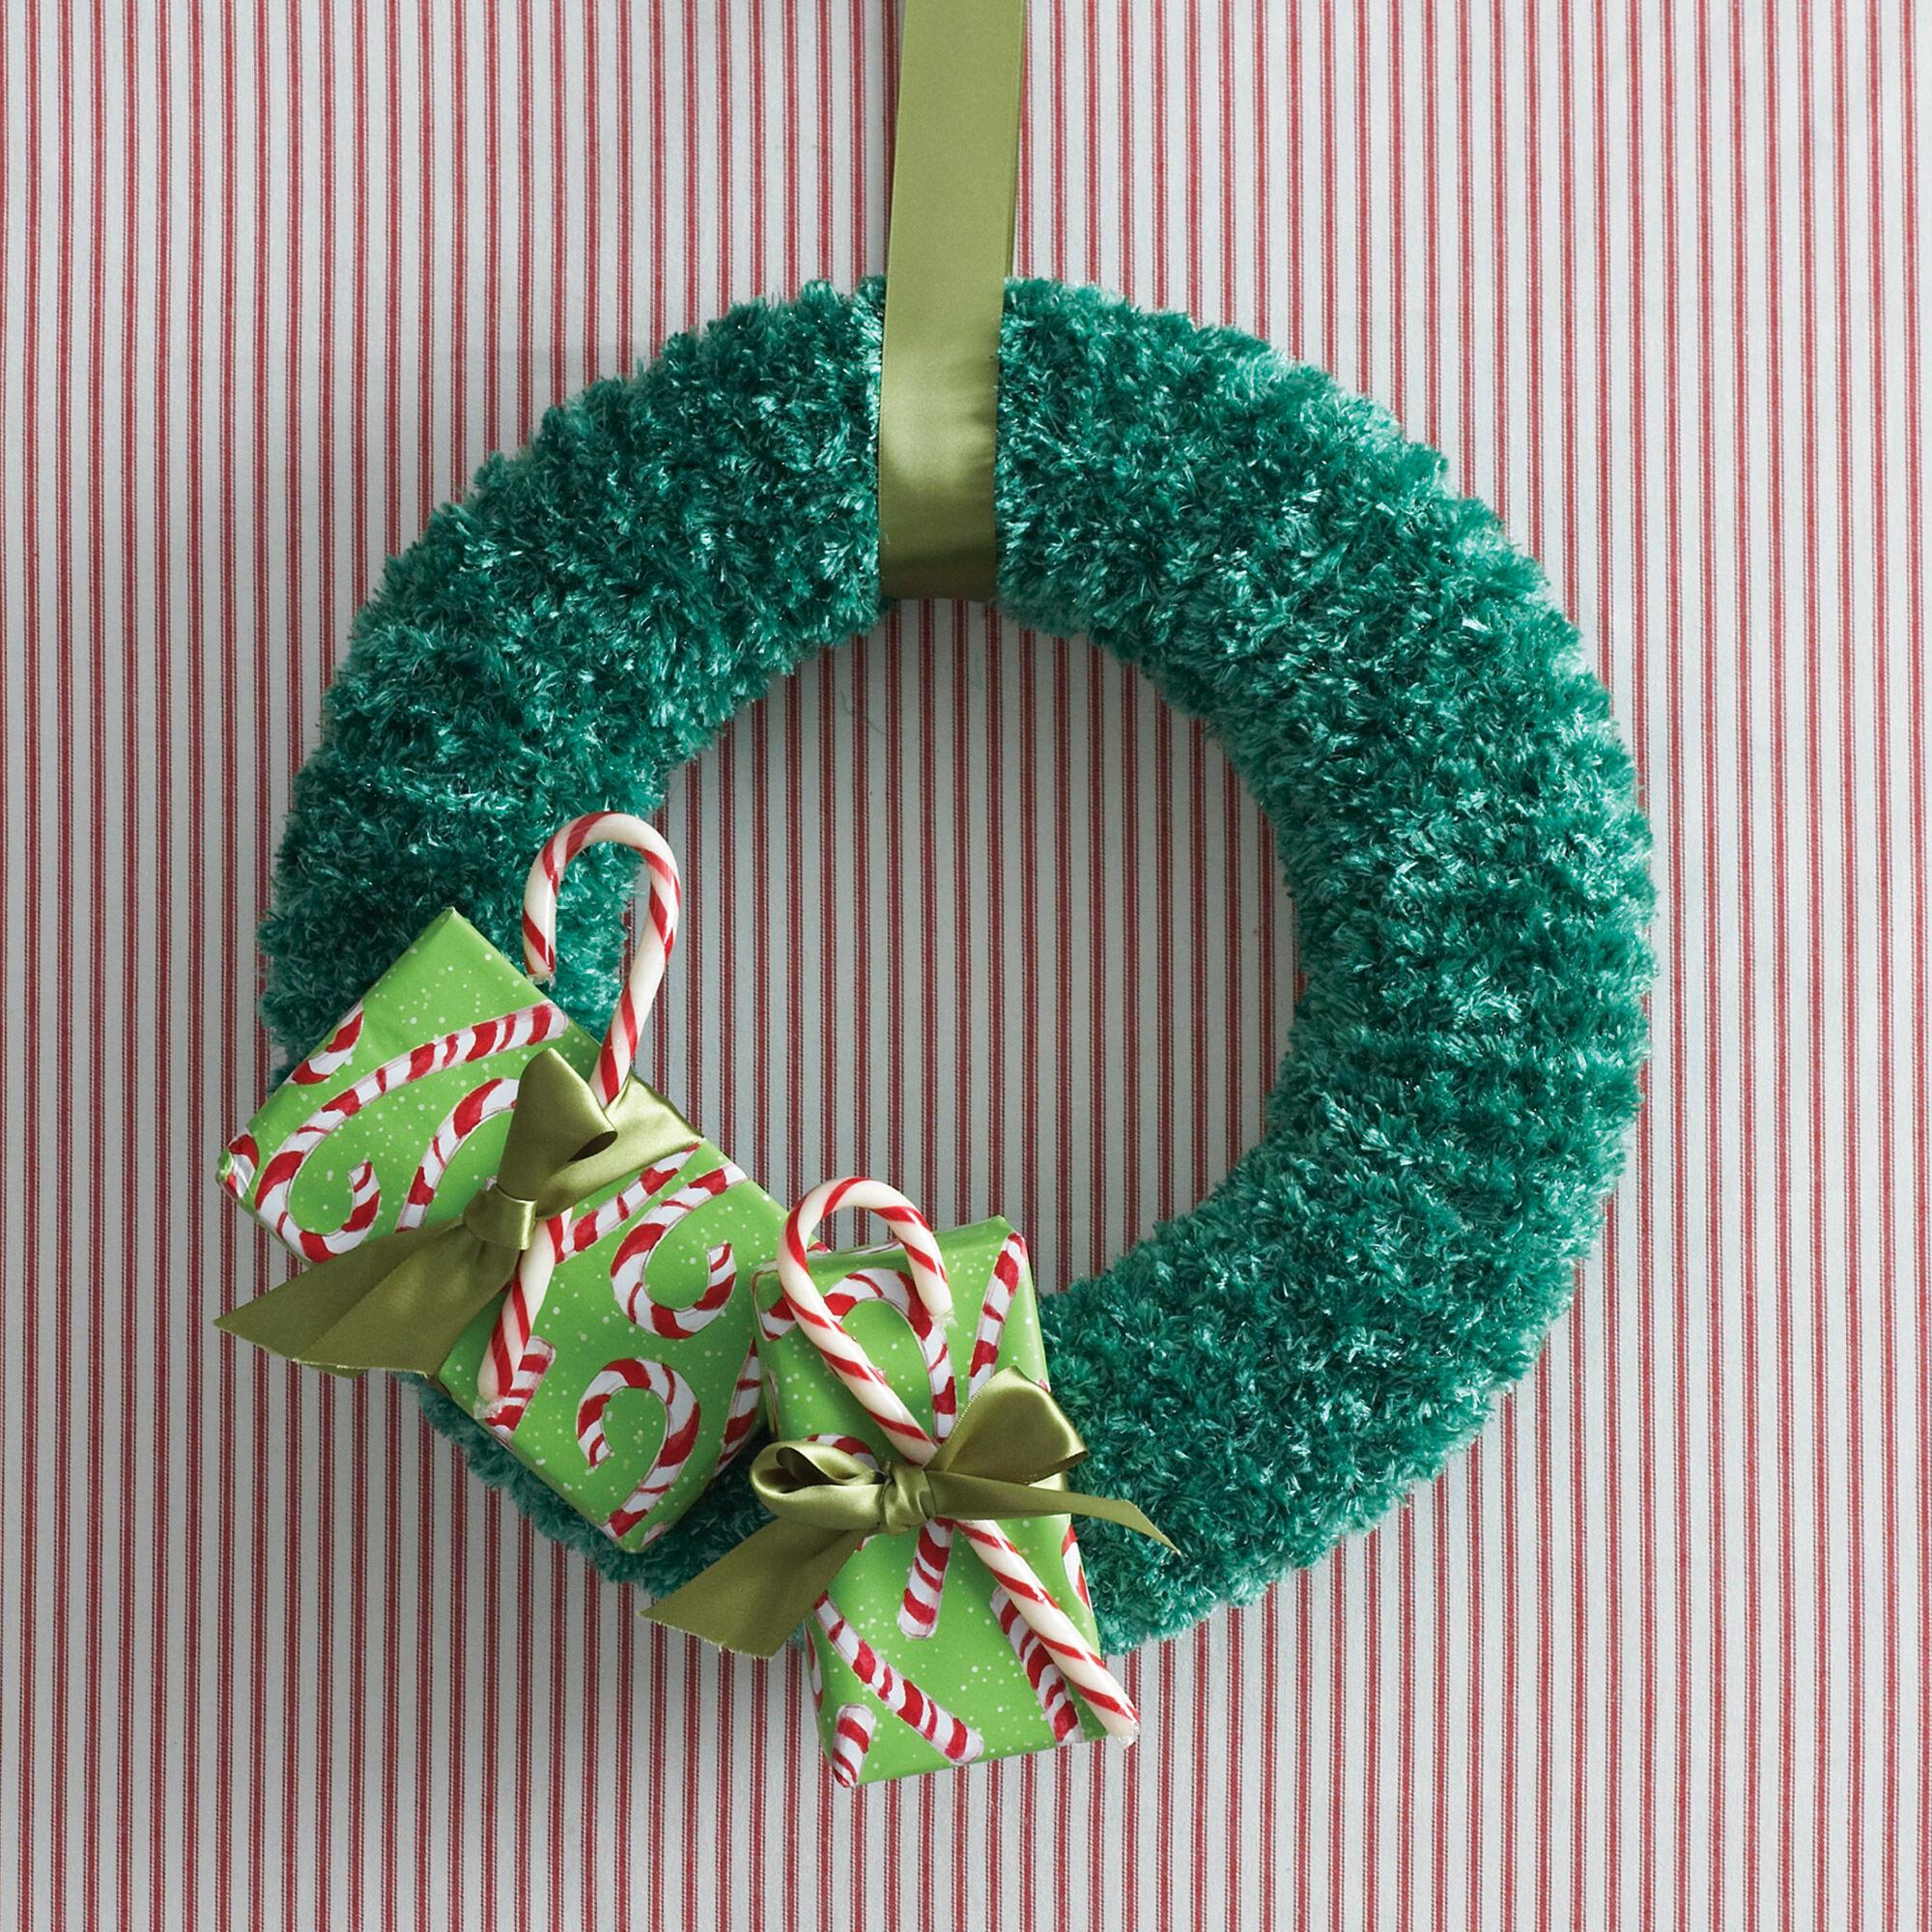 Bernat Holidays Christmas Wreath to Knit | Yarnspirations